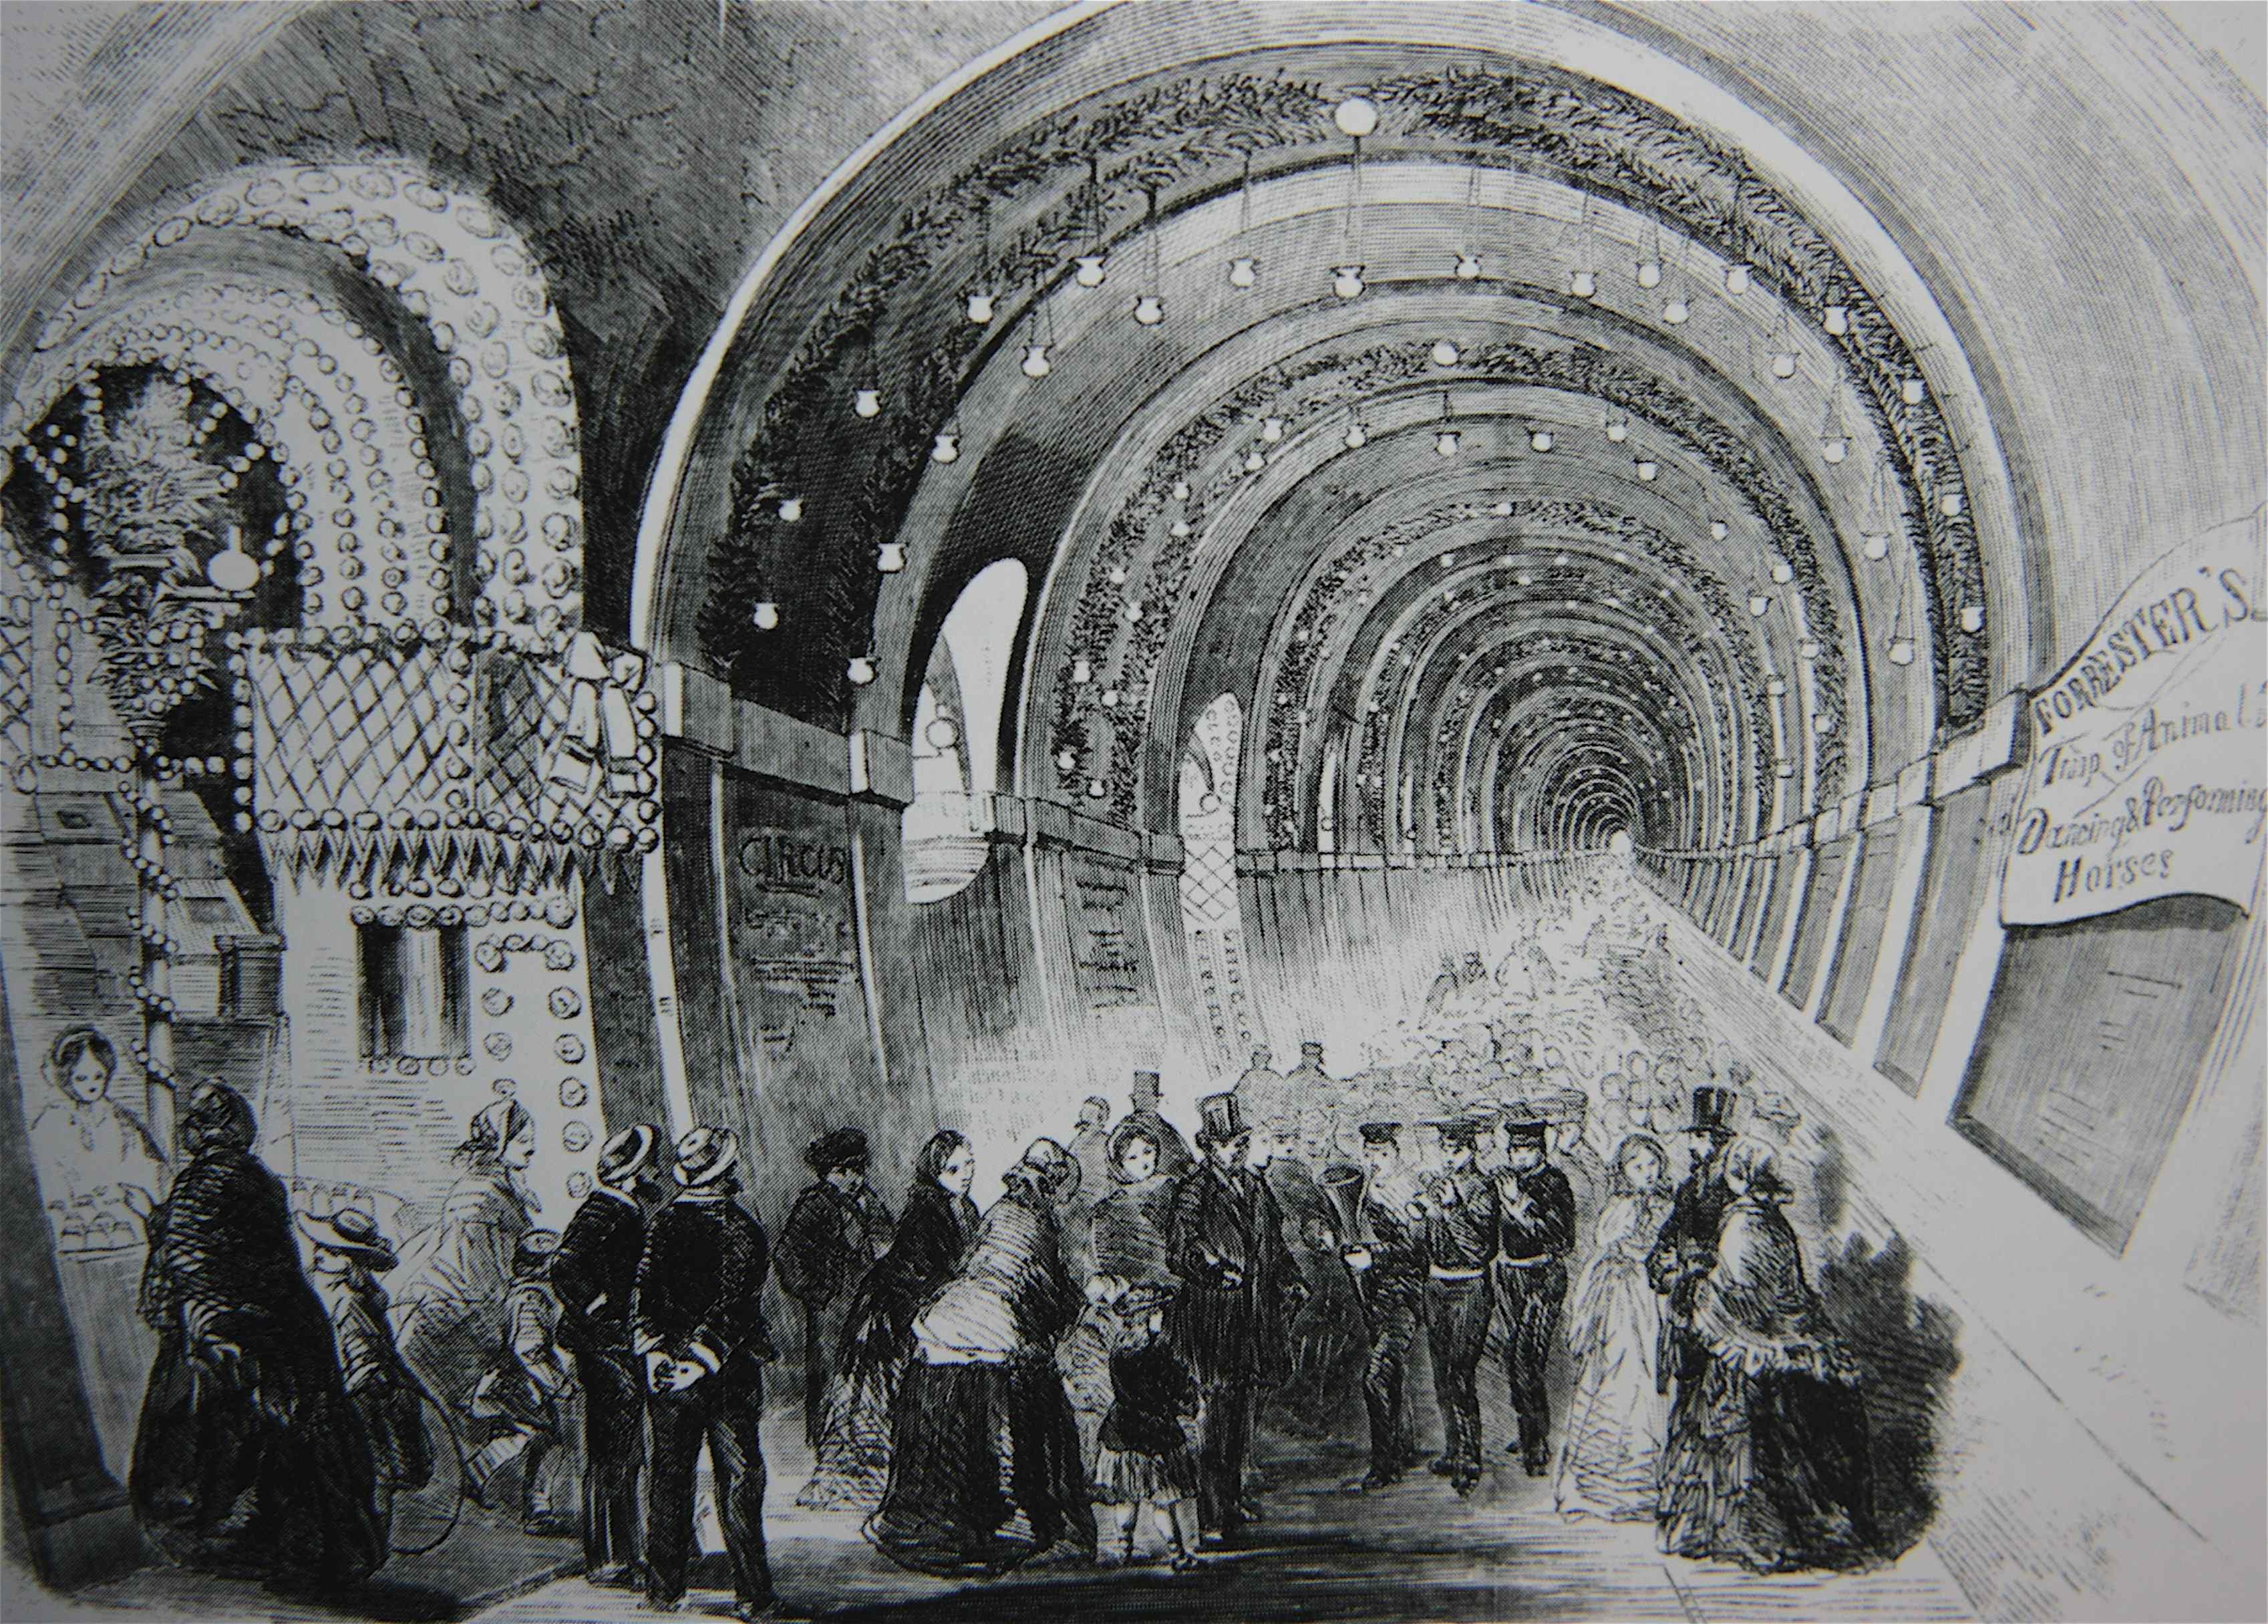 history underground: